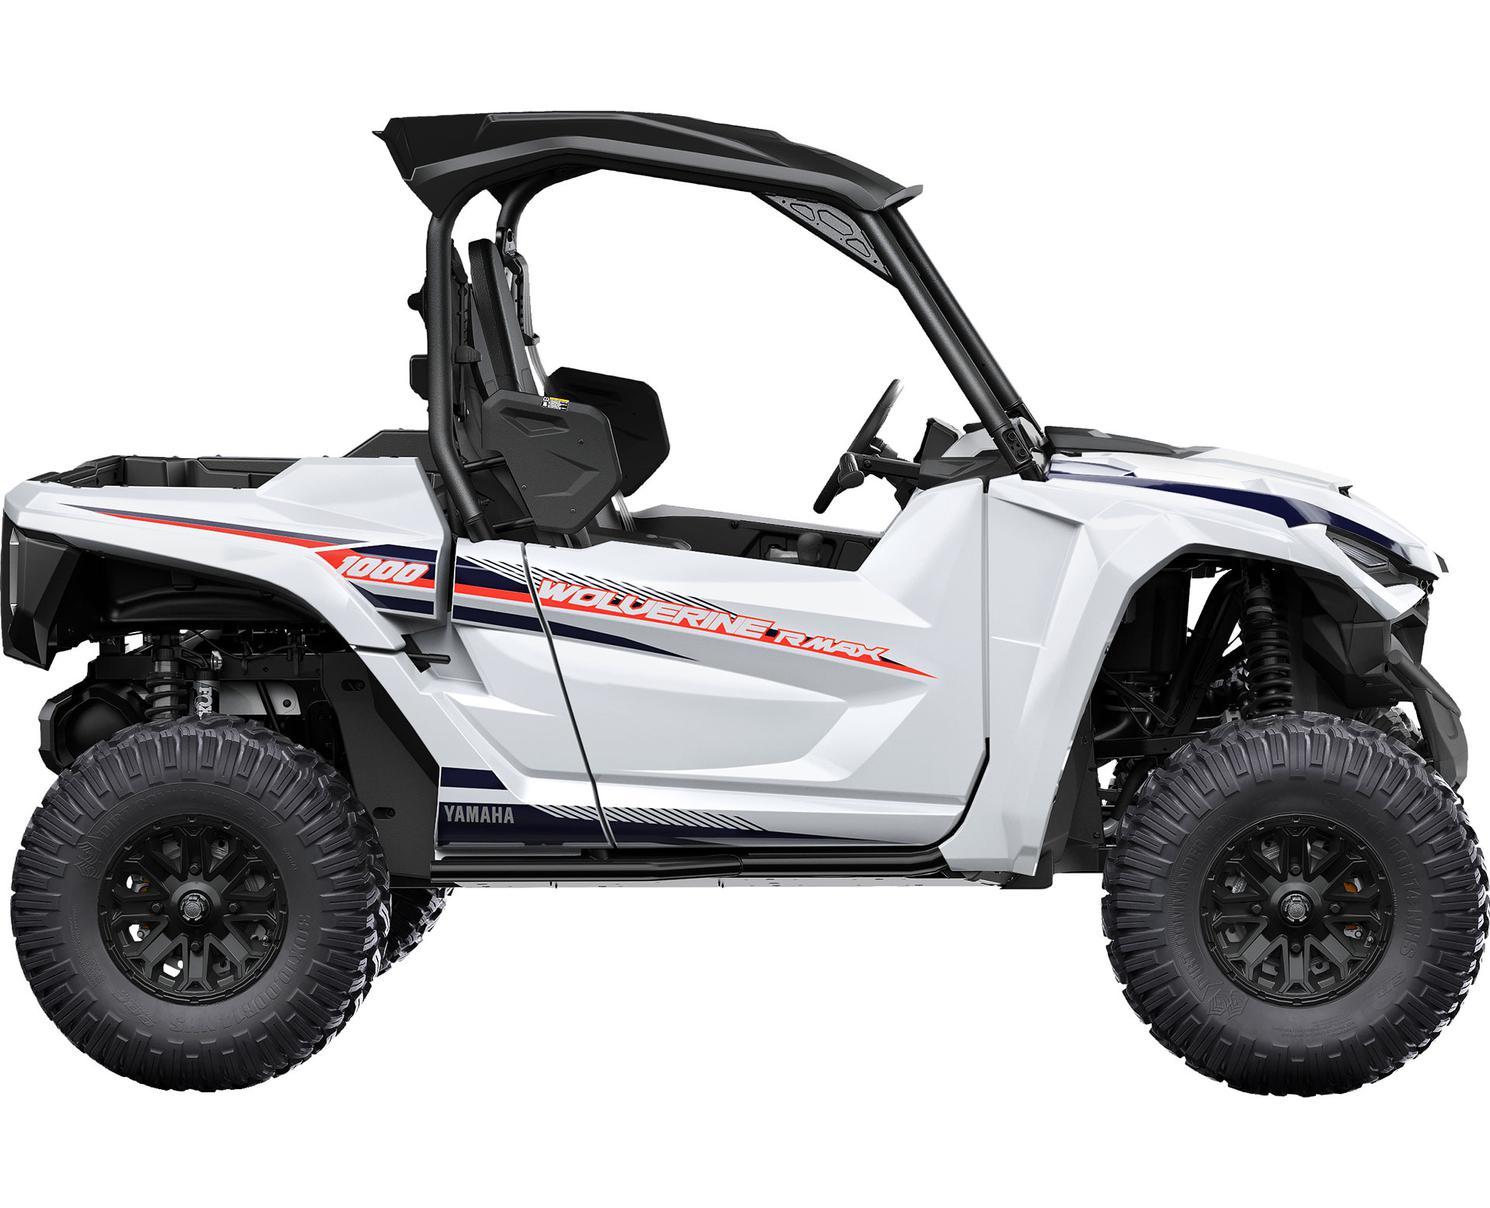 2021 Yamaha Wolverine RMAX2 1000 EPS Alpine White